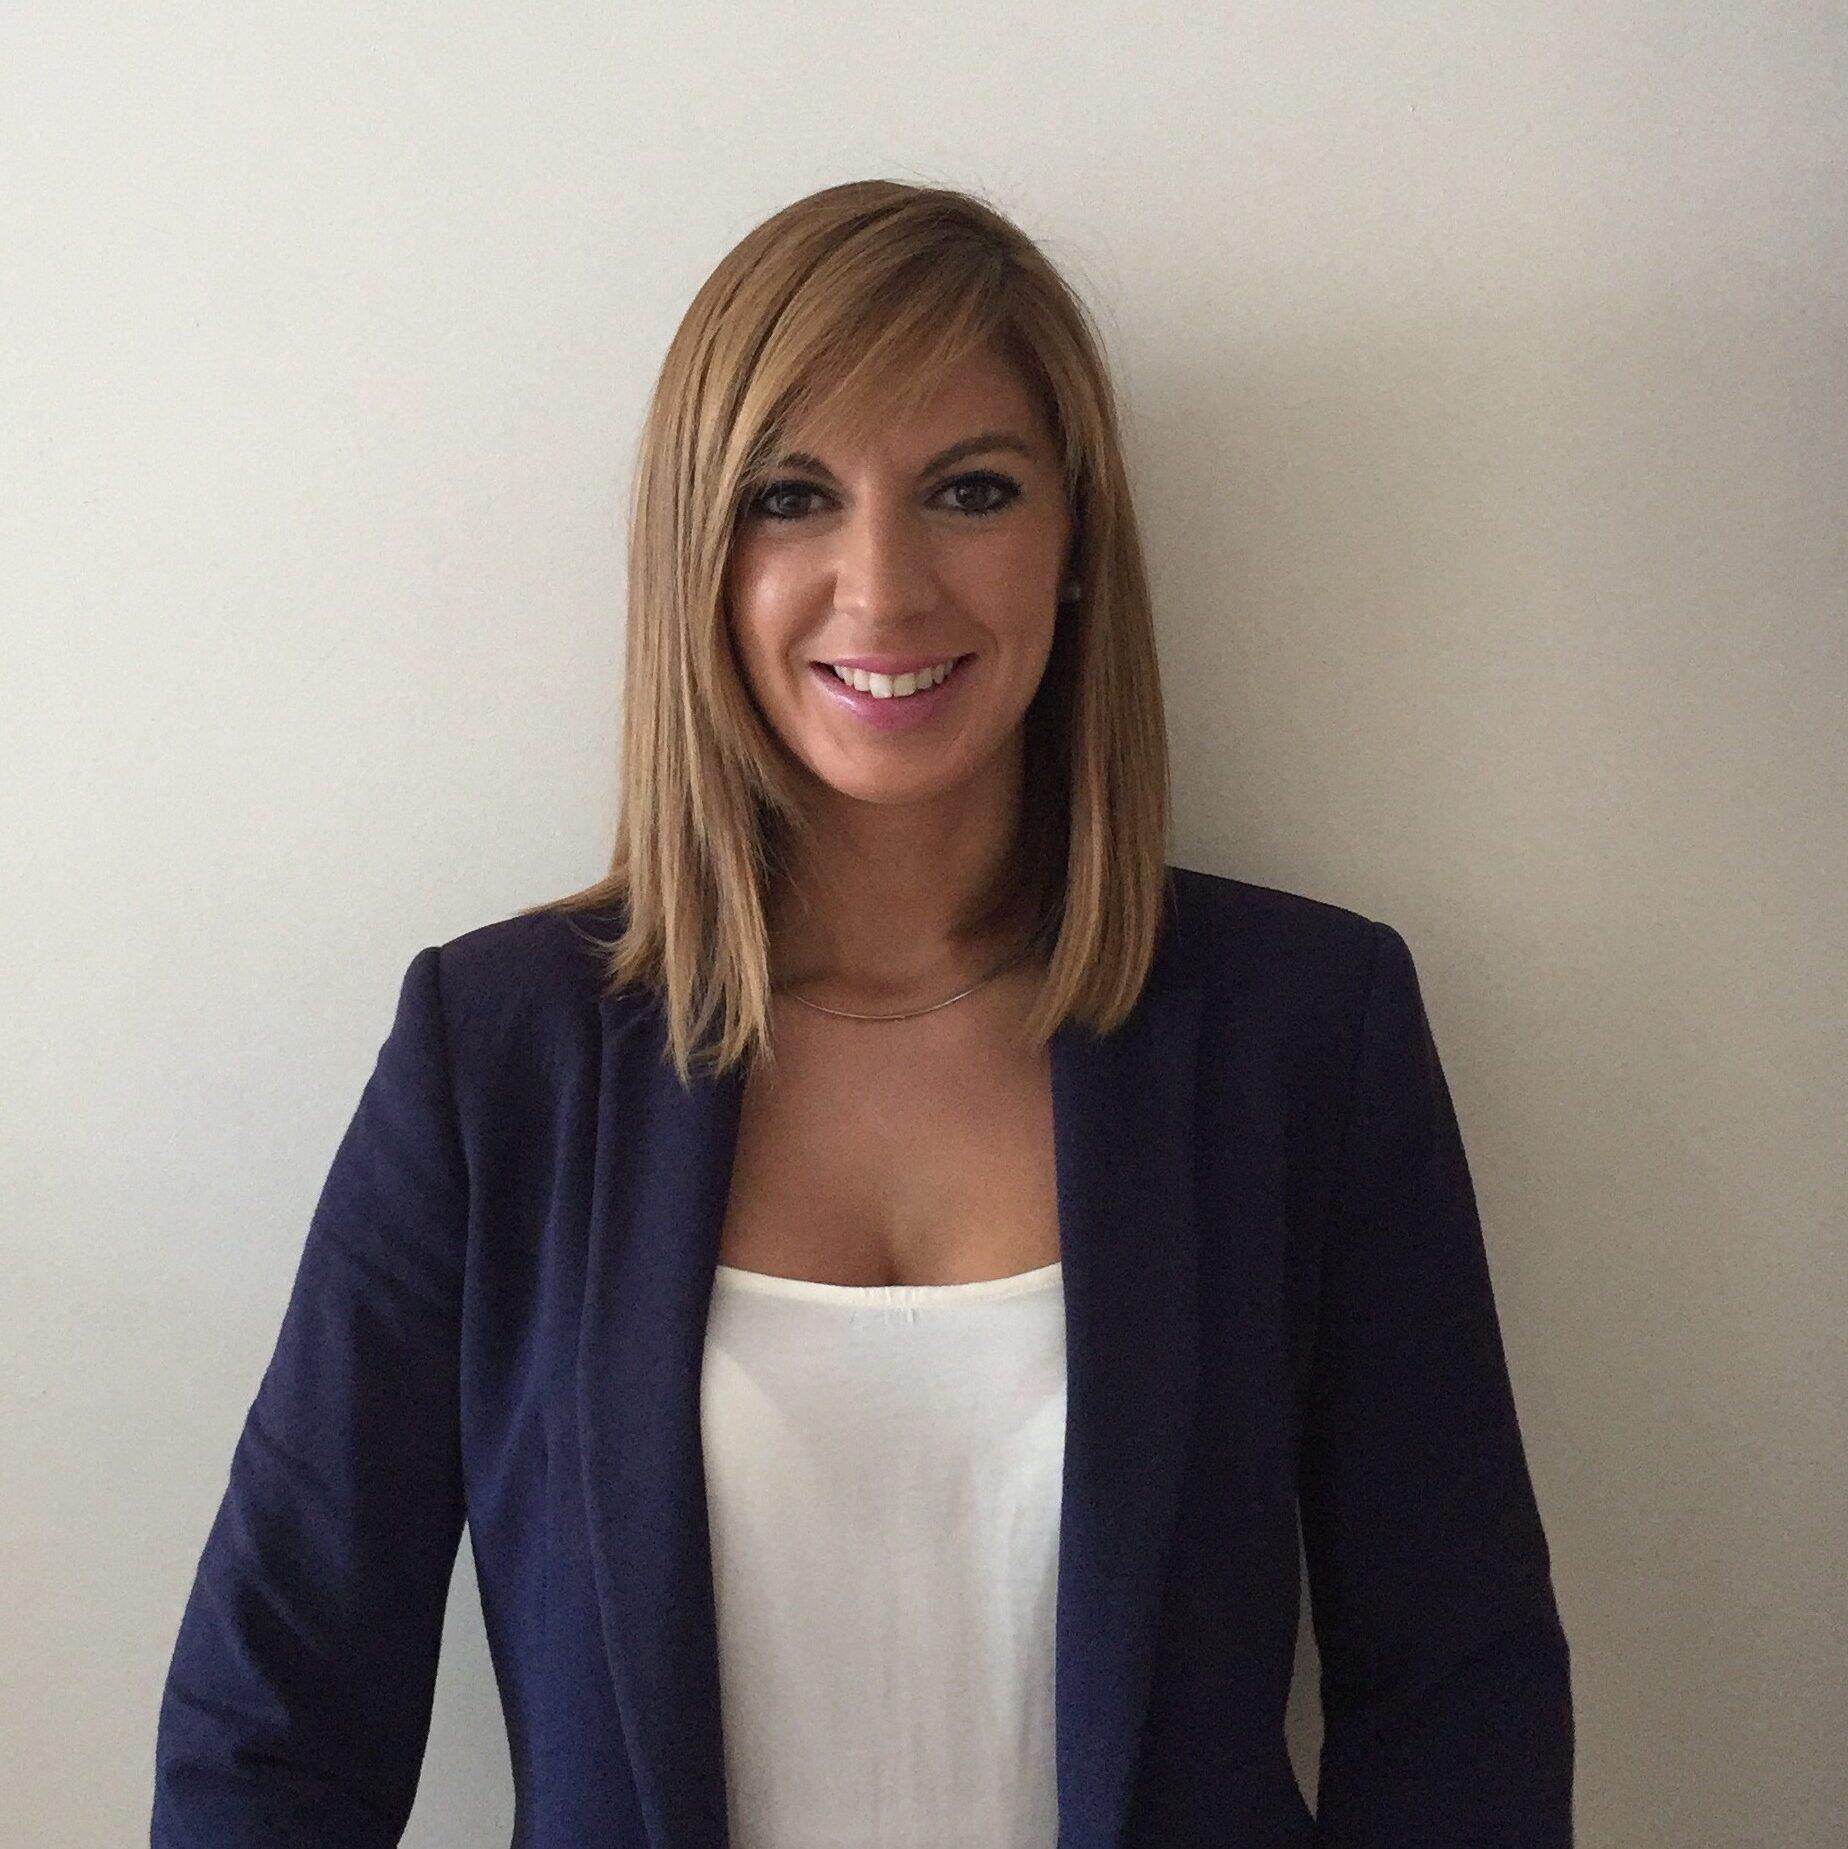 Miriam Valverde Troya